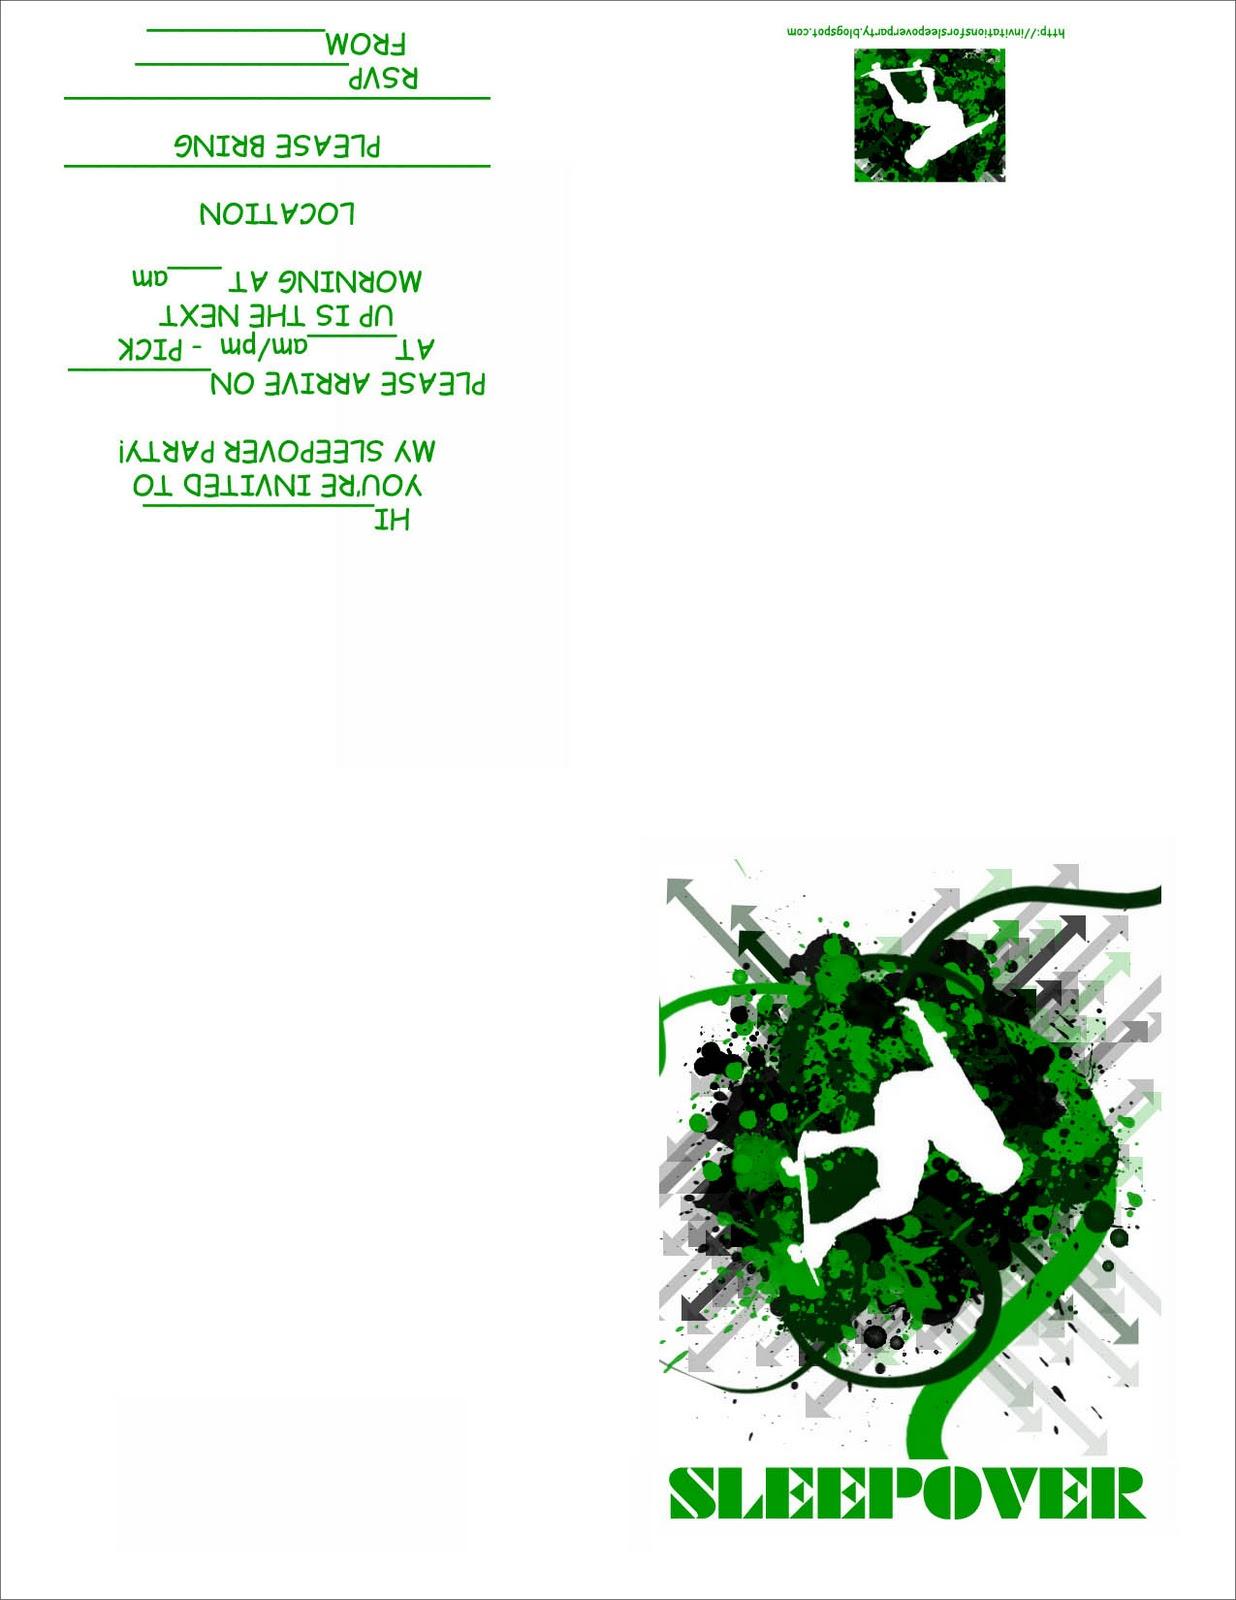 birthday sleepover invitations free printable Baskanidaico